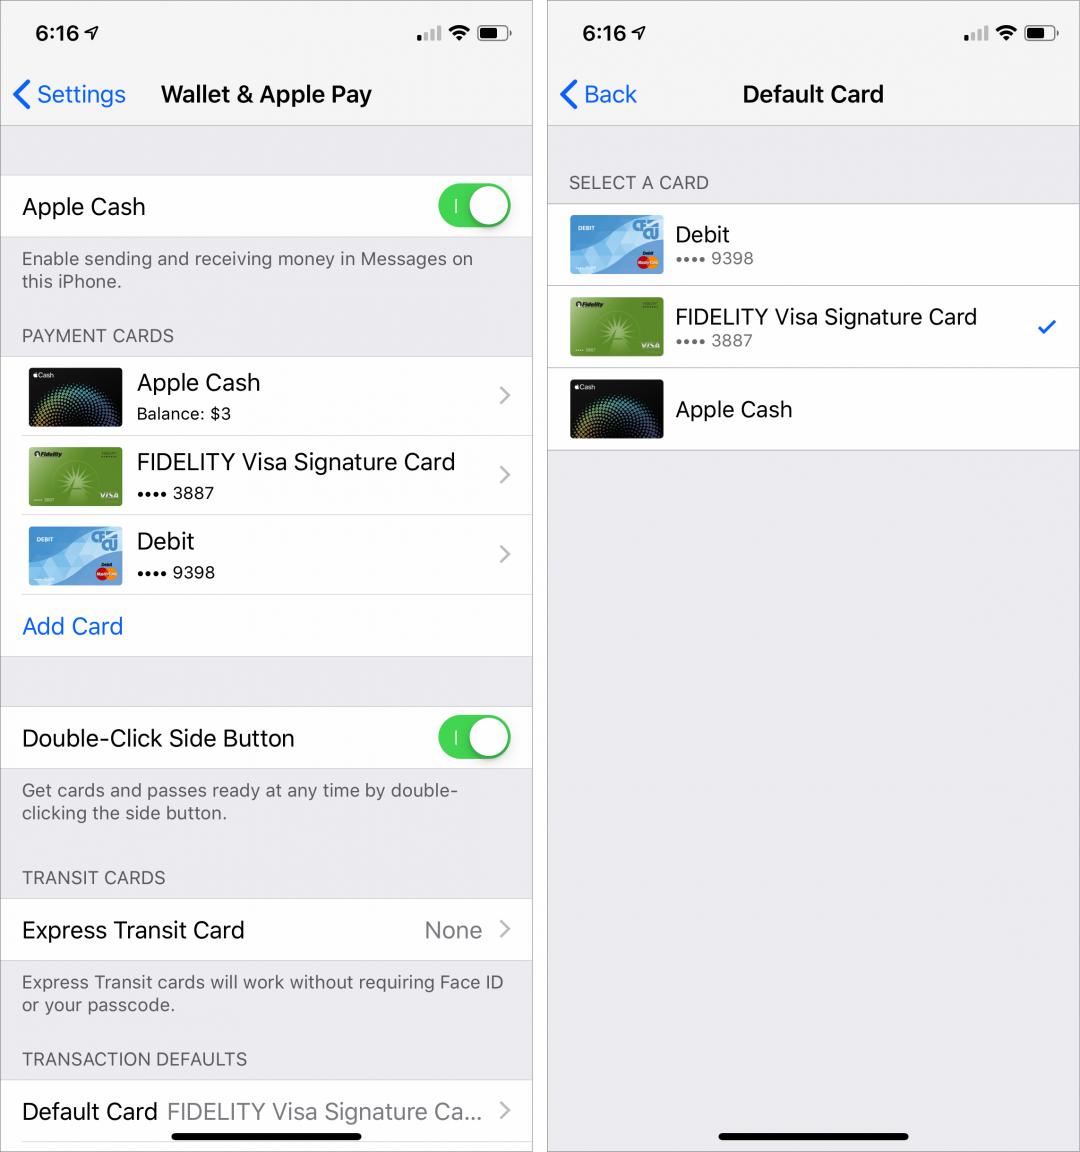 Wallet-default-credit-card-1080x1152.png